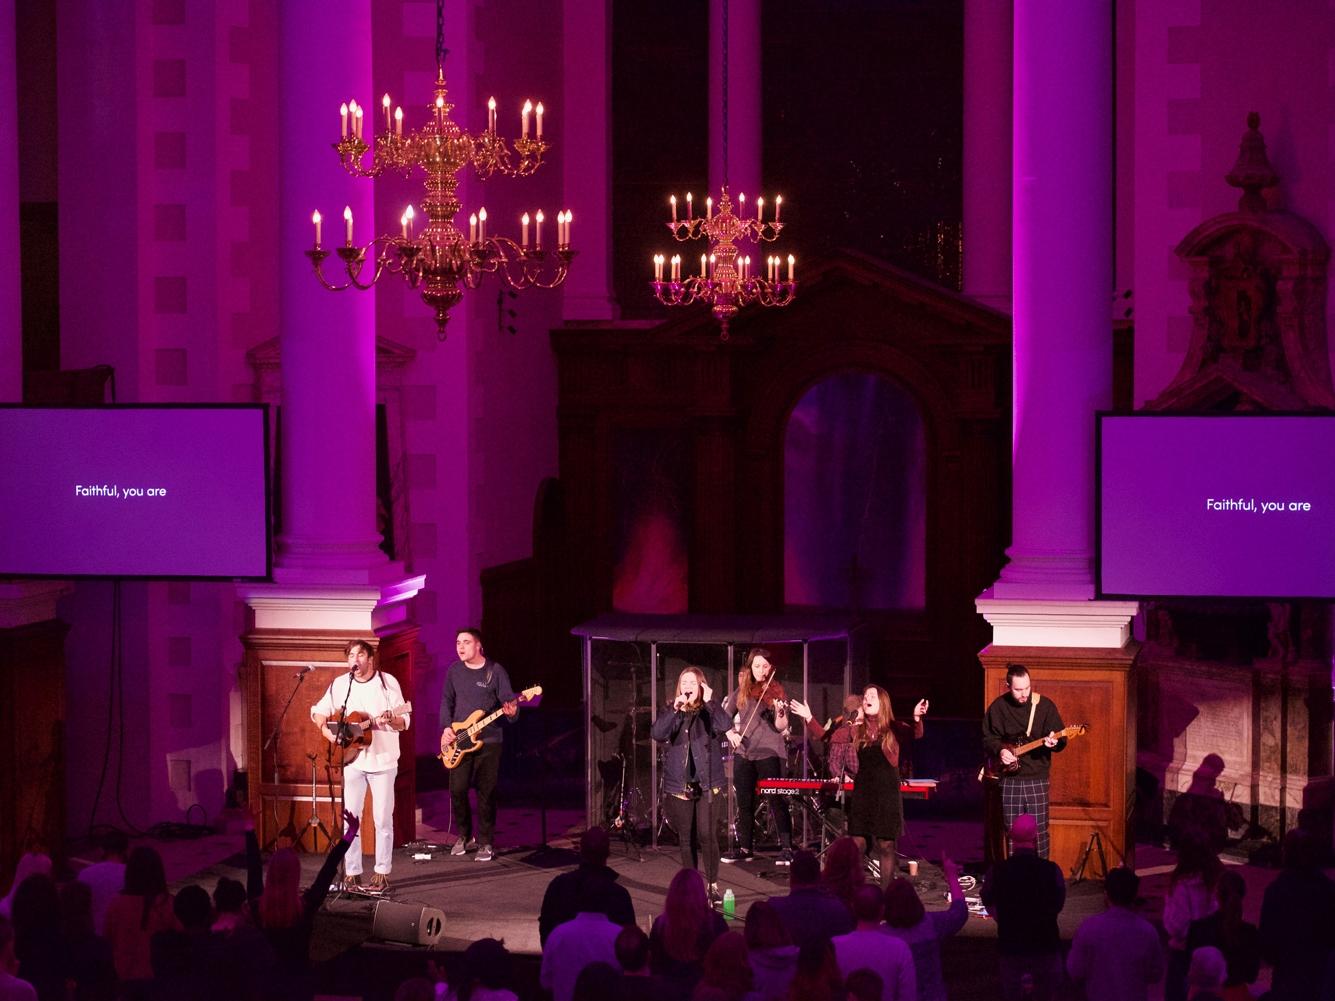 Christ church spitalfields -